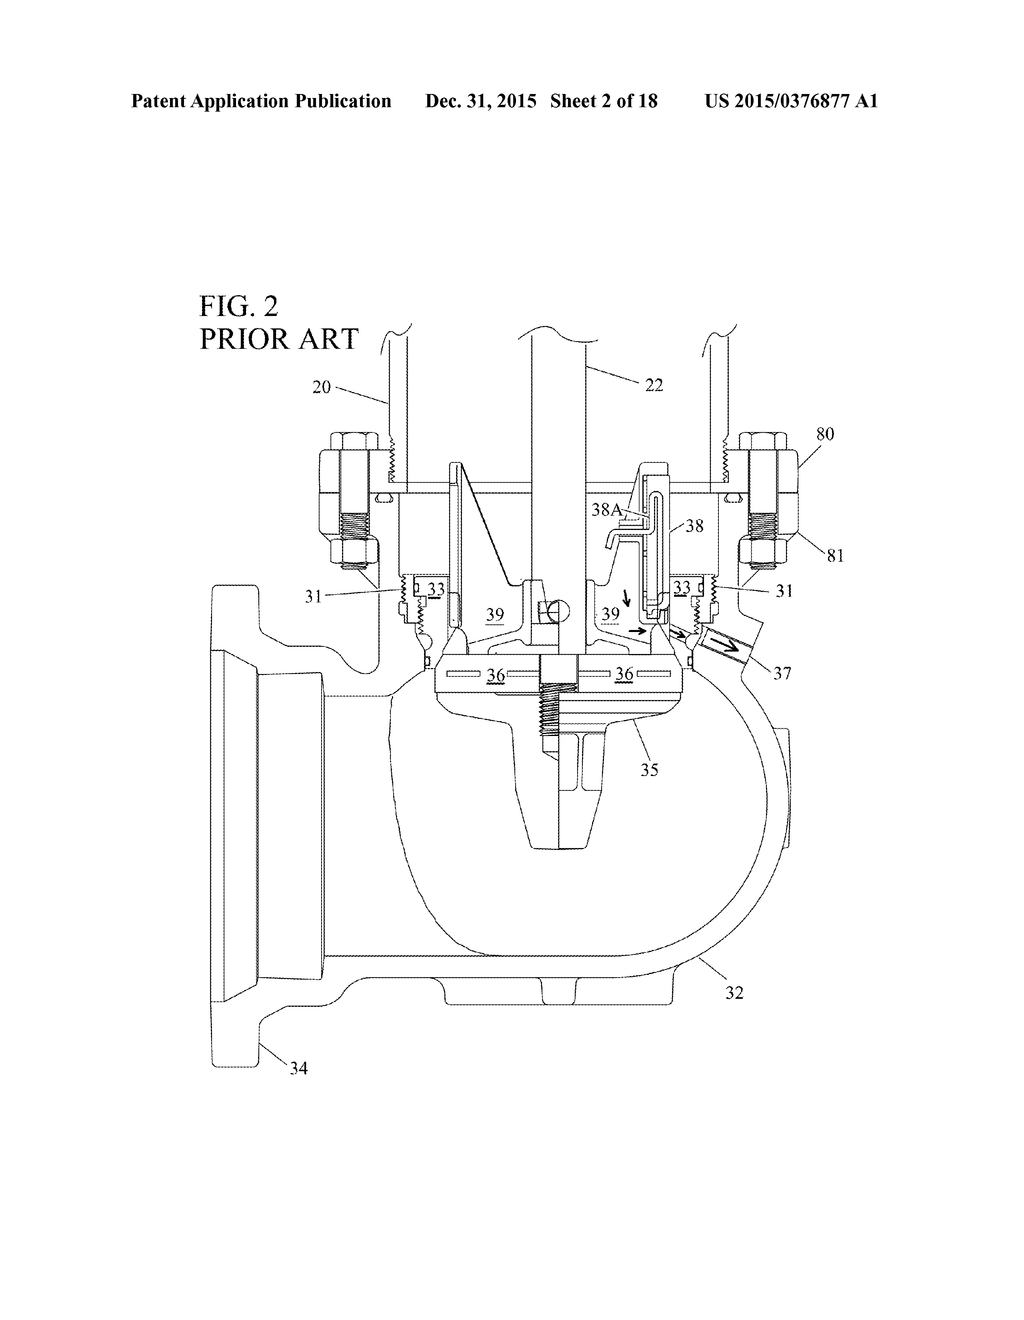 Biased Drain Valve for Dry Barrel Fire Hydrant - diagram, schematic on check valve schematic diagram, fire hydrant installation diagram, fire pump schematic diagram, traffic light schematic diagram, sprinkler schematic diagram,